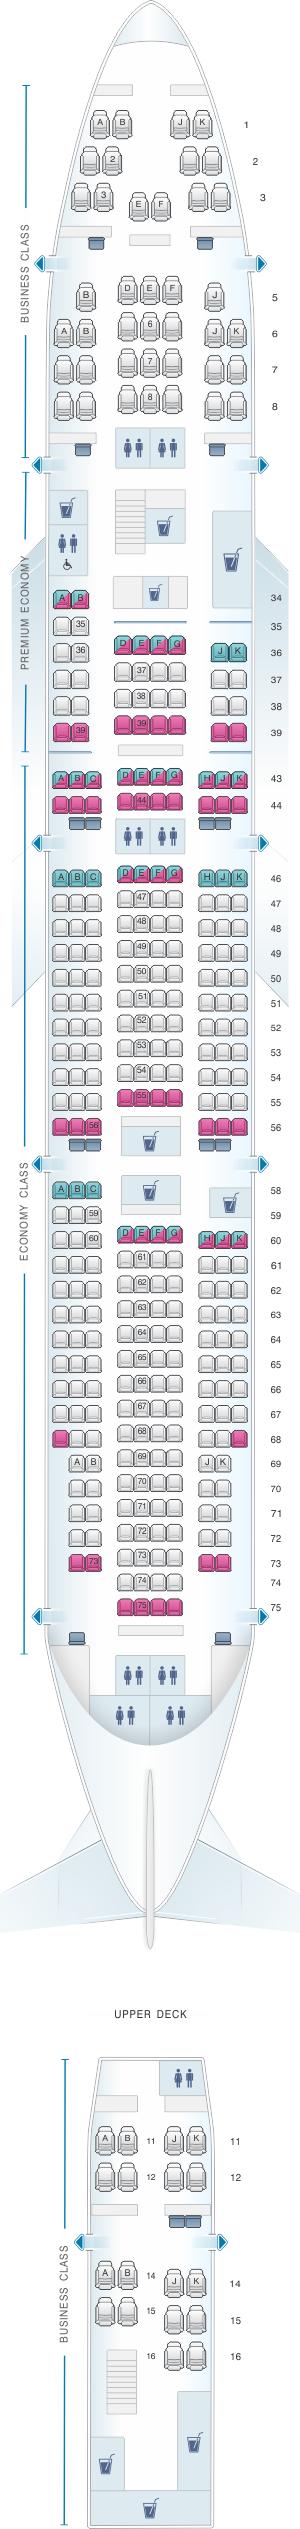 Seat map for Qantas Airways Boeing B747 400 364PAX